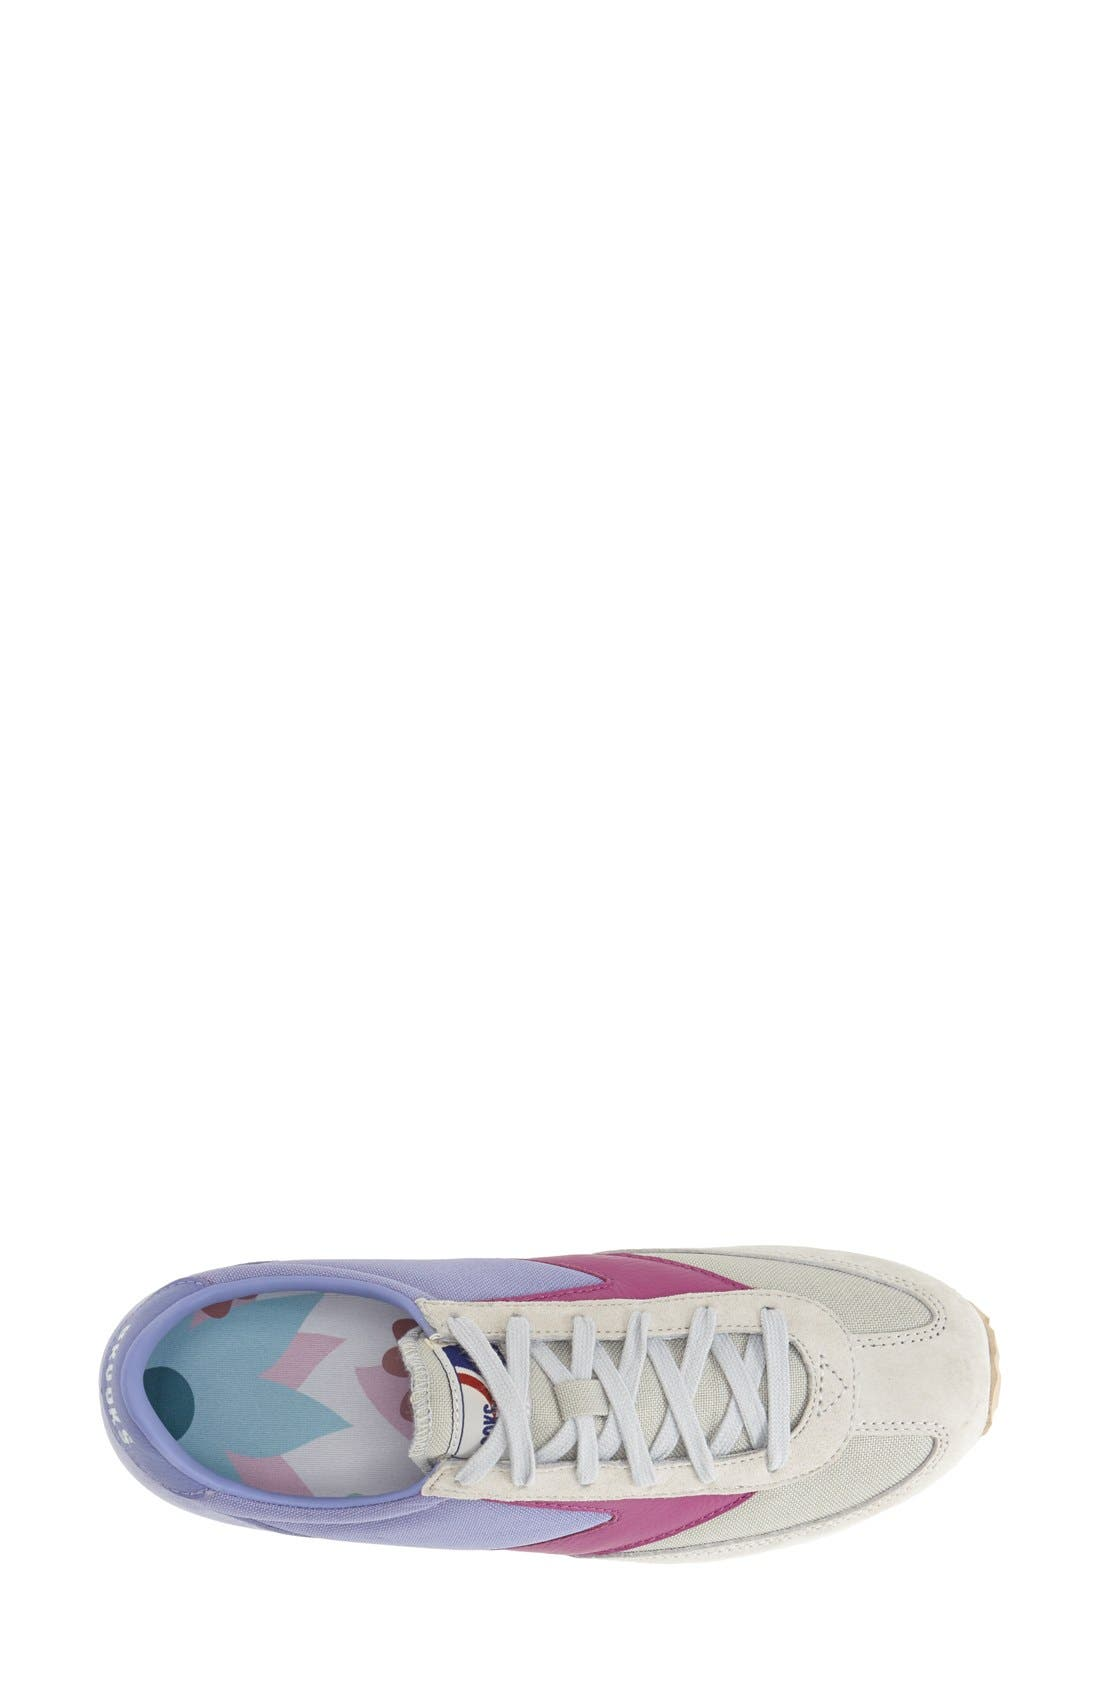 'Vanguard' Sneaker,                             Alternate thumbnail 65, color,